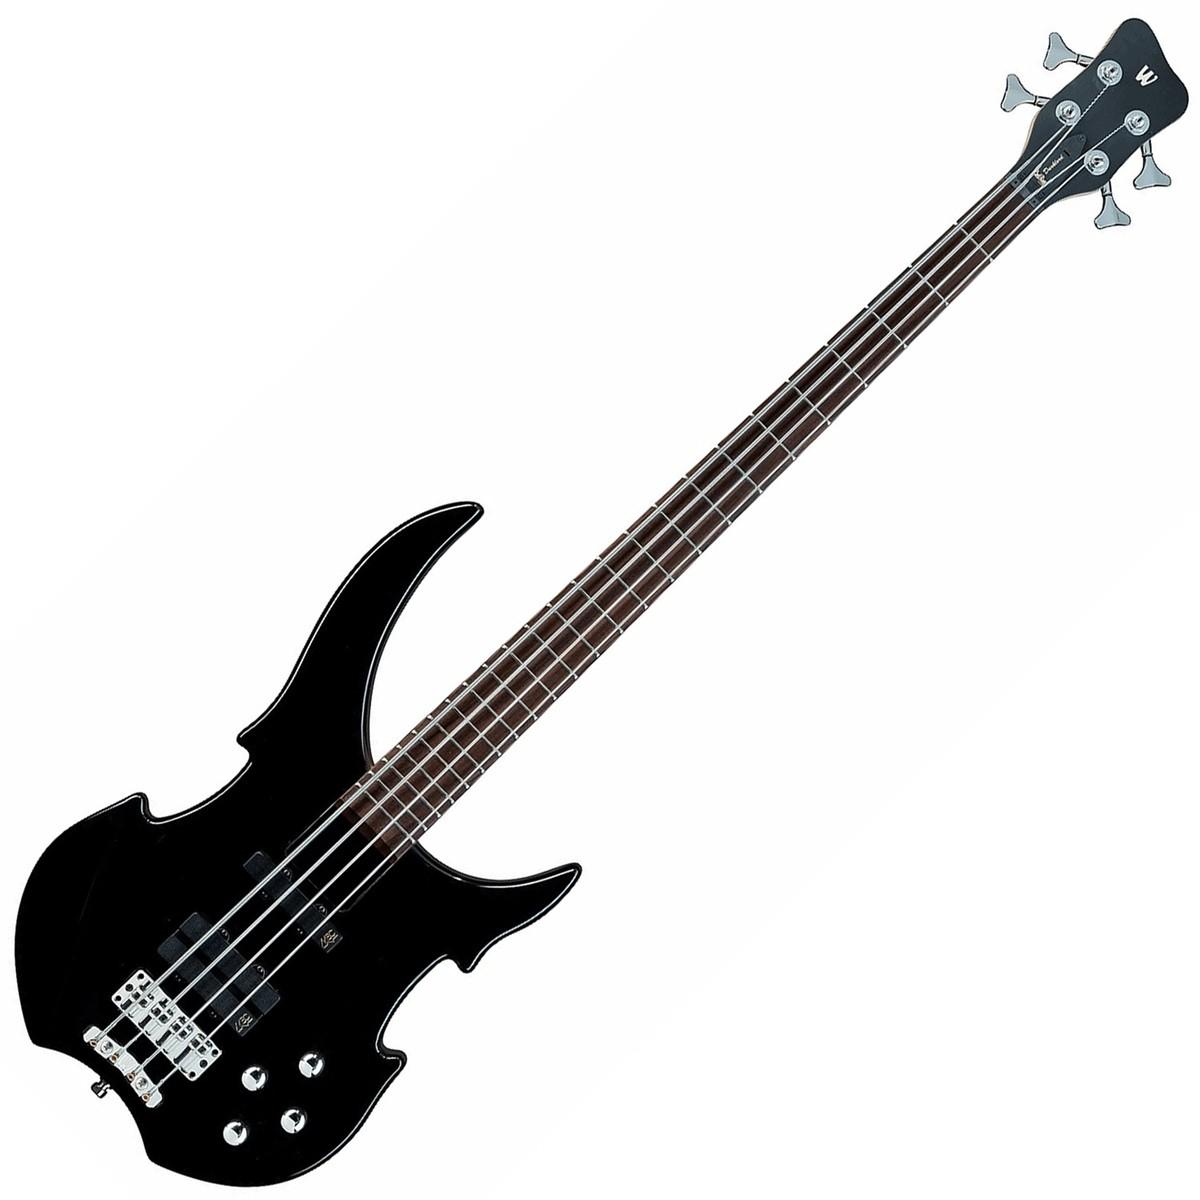 warwick rockbass vampyre dark lord 4 string bass guitar black at. Black Bedroom Furniture Sets. Home Design Ideas